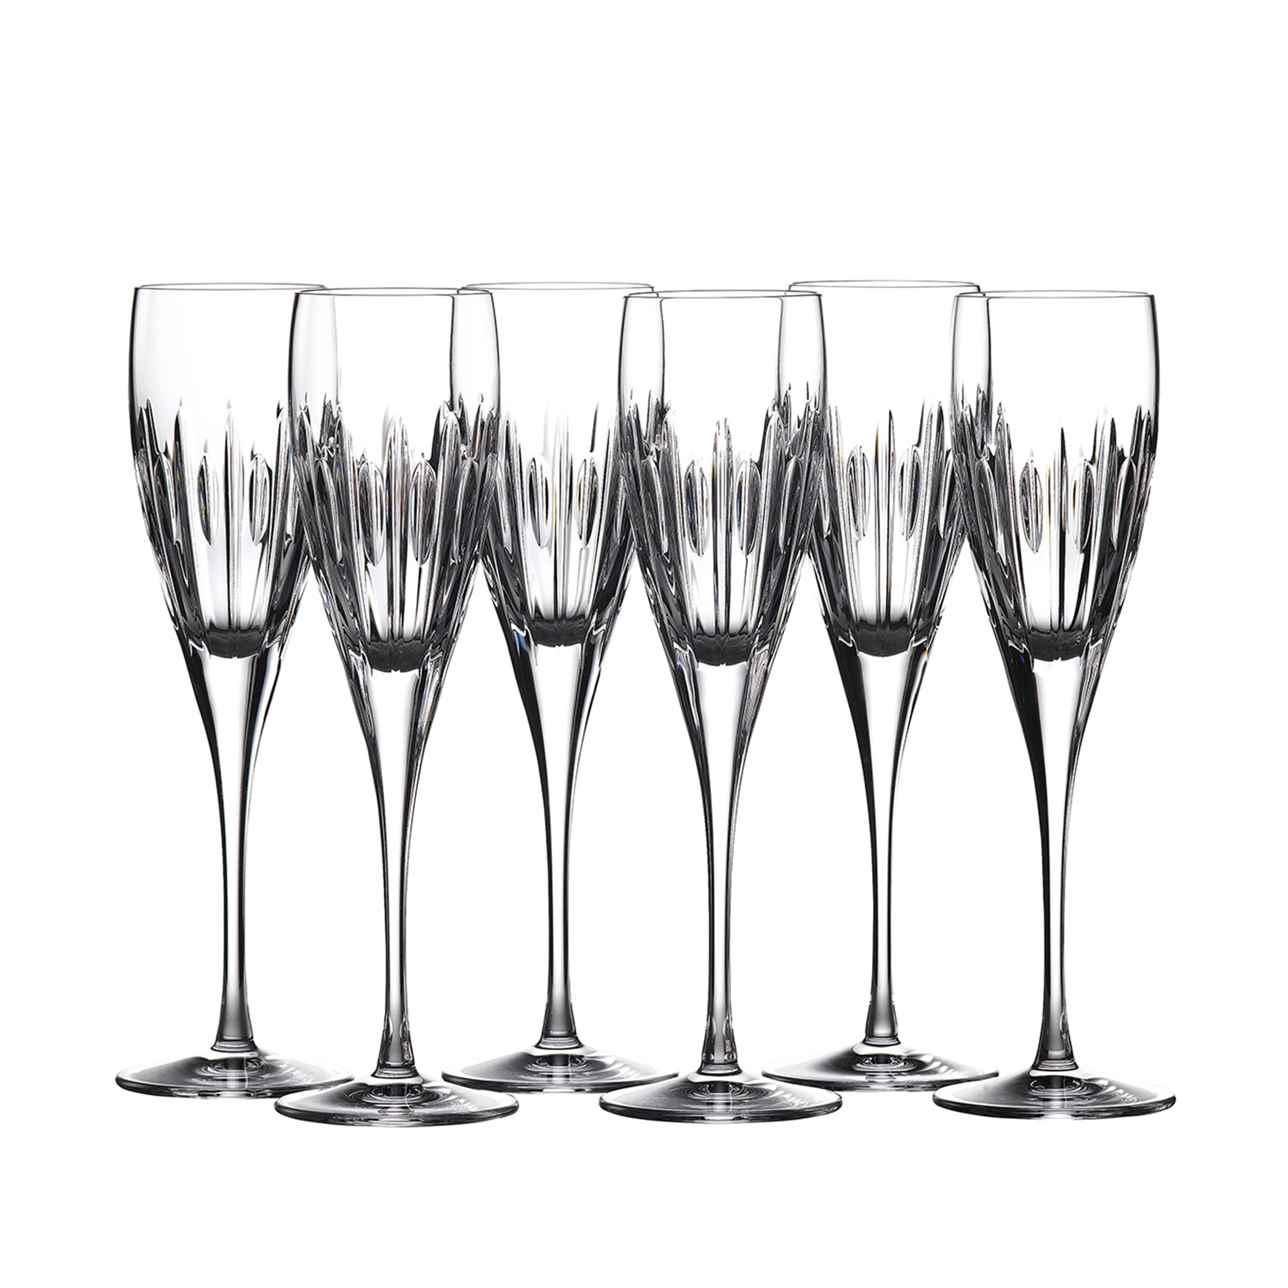 Mara Champagne Flute, Set of 6